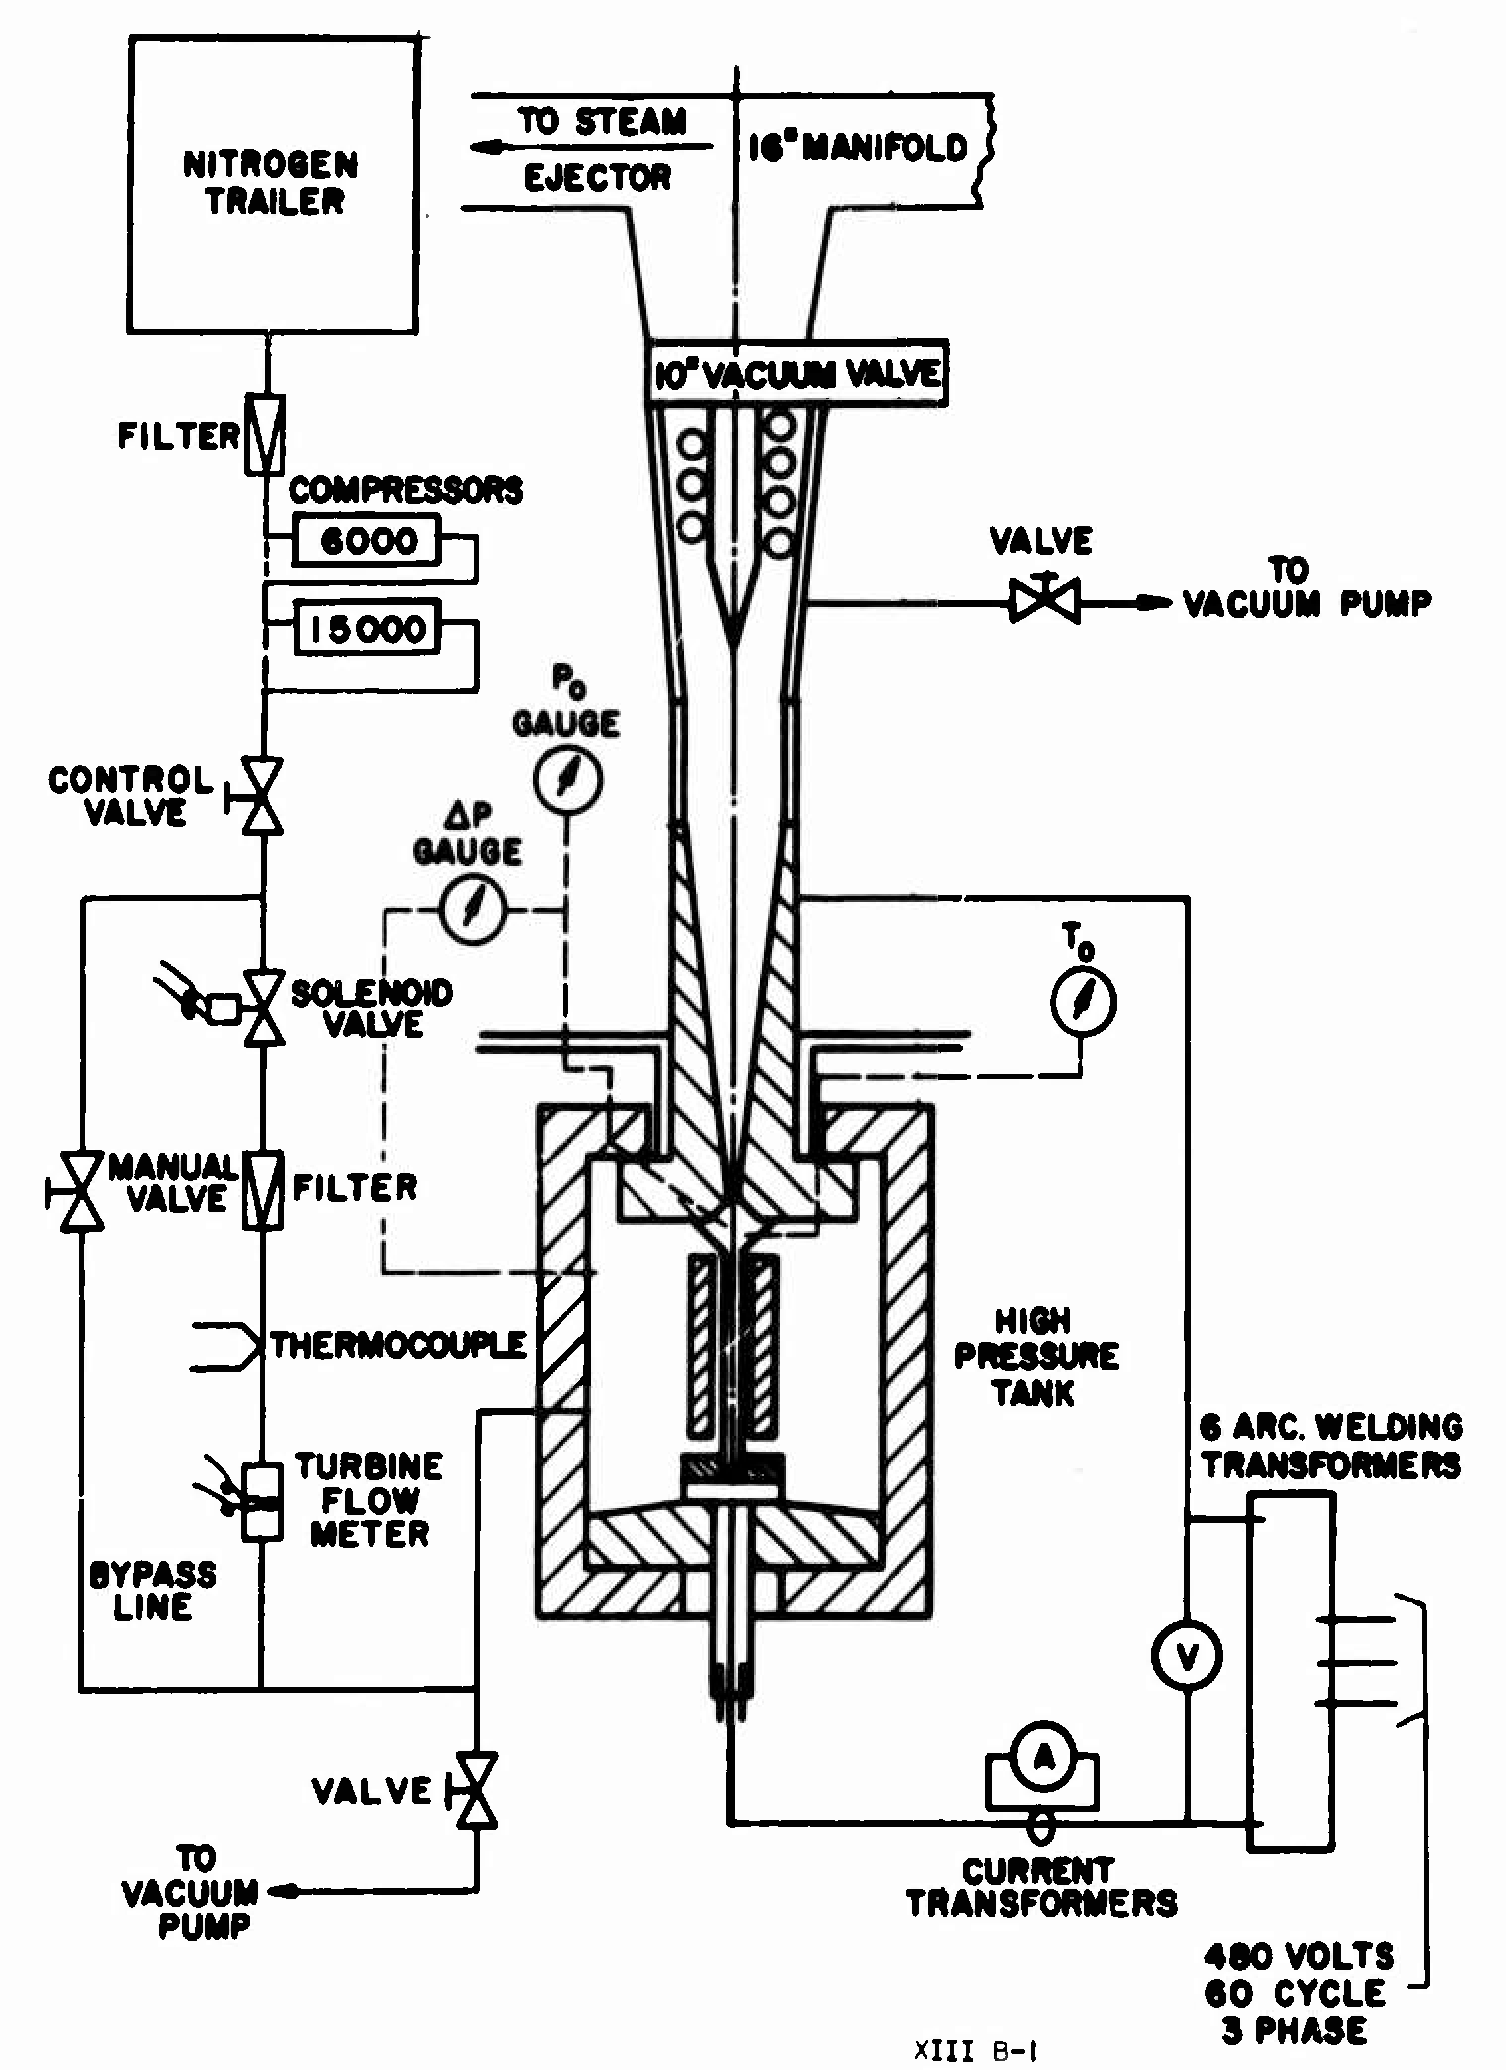 Figure I From Afsr 5440 Furtvier Devel 0 B 4 Emt Of A Grawite 3 Phase Welding Transformer Diagram Line Uf The High Pressure Temperature Nitrogen Facility